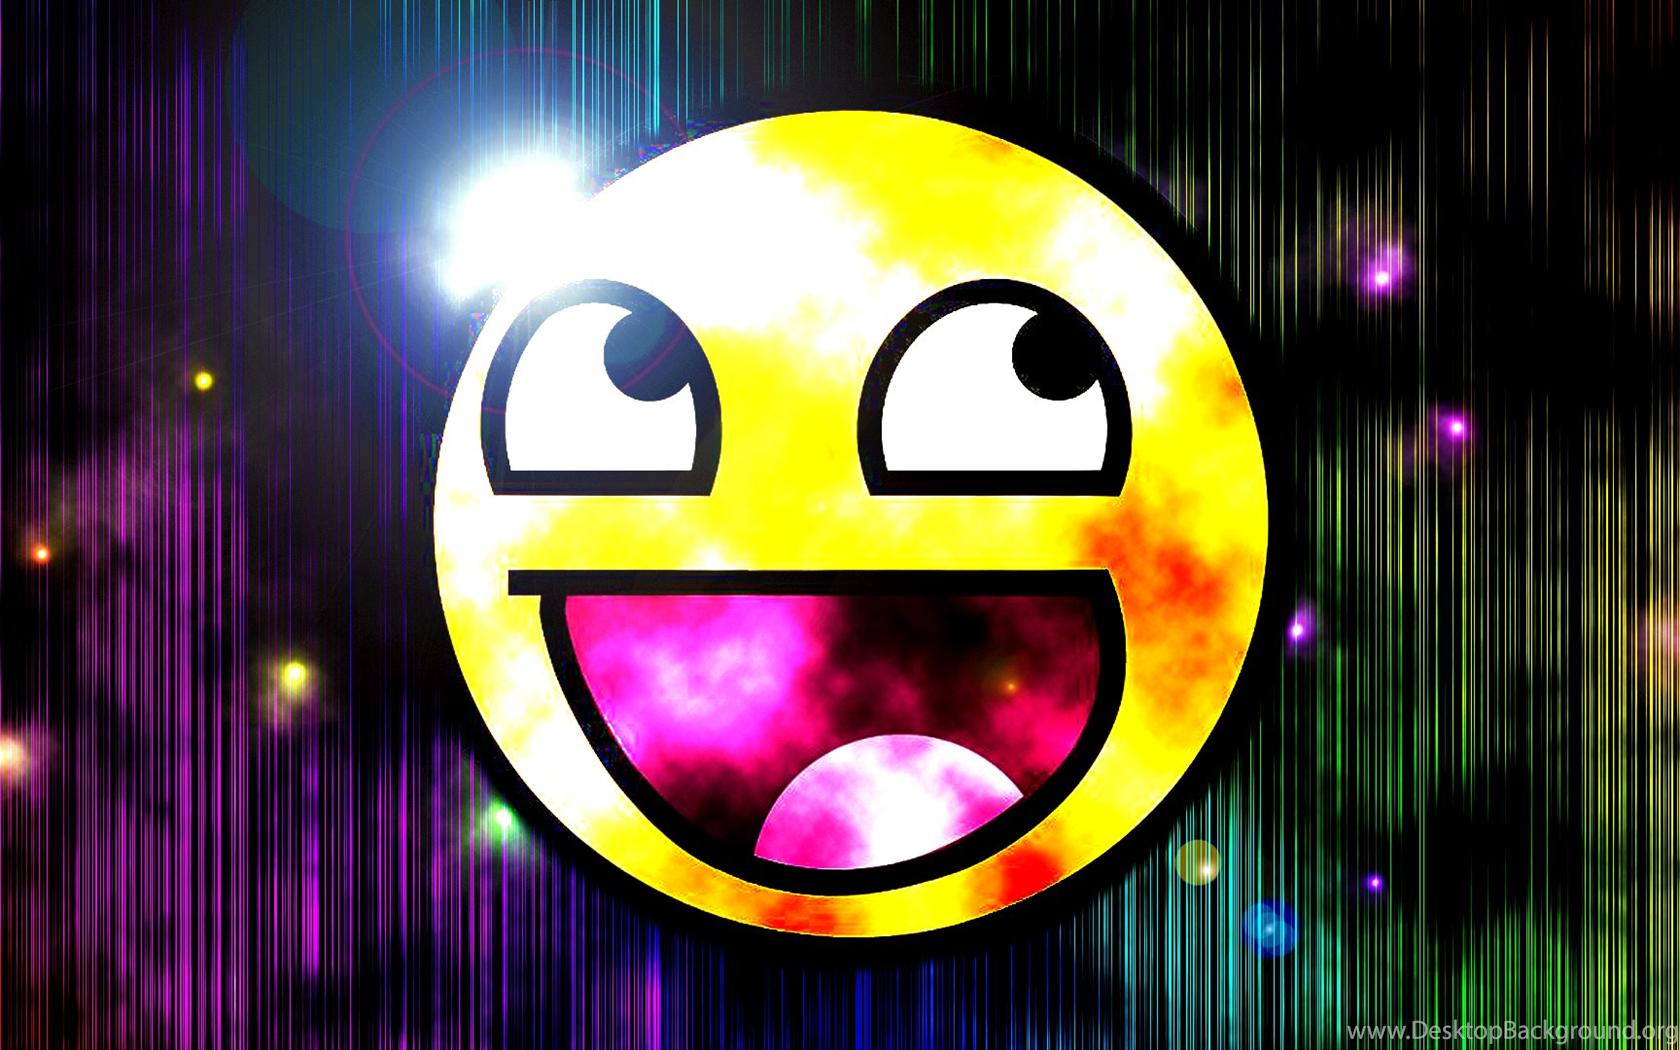 Hd Smiley Face Wallpaper: Epic Face Backgrounds Desktop Background